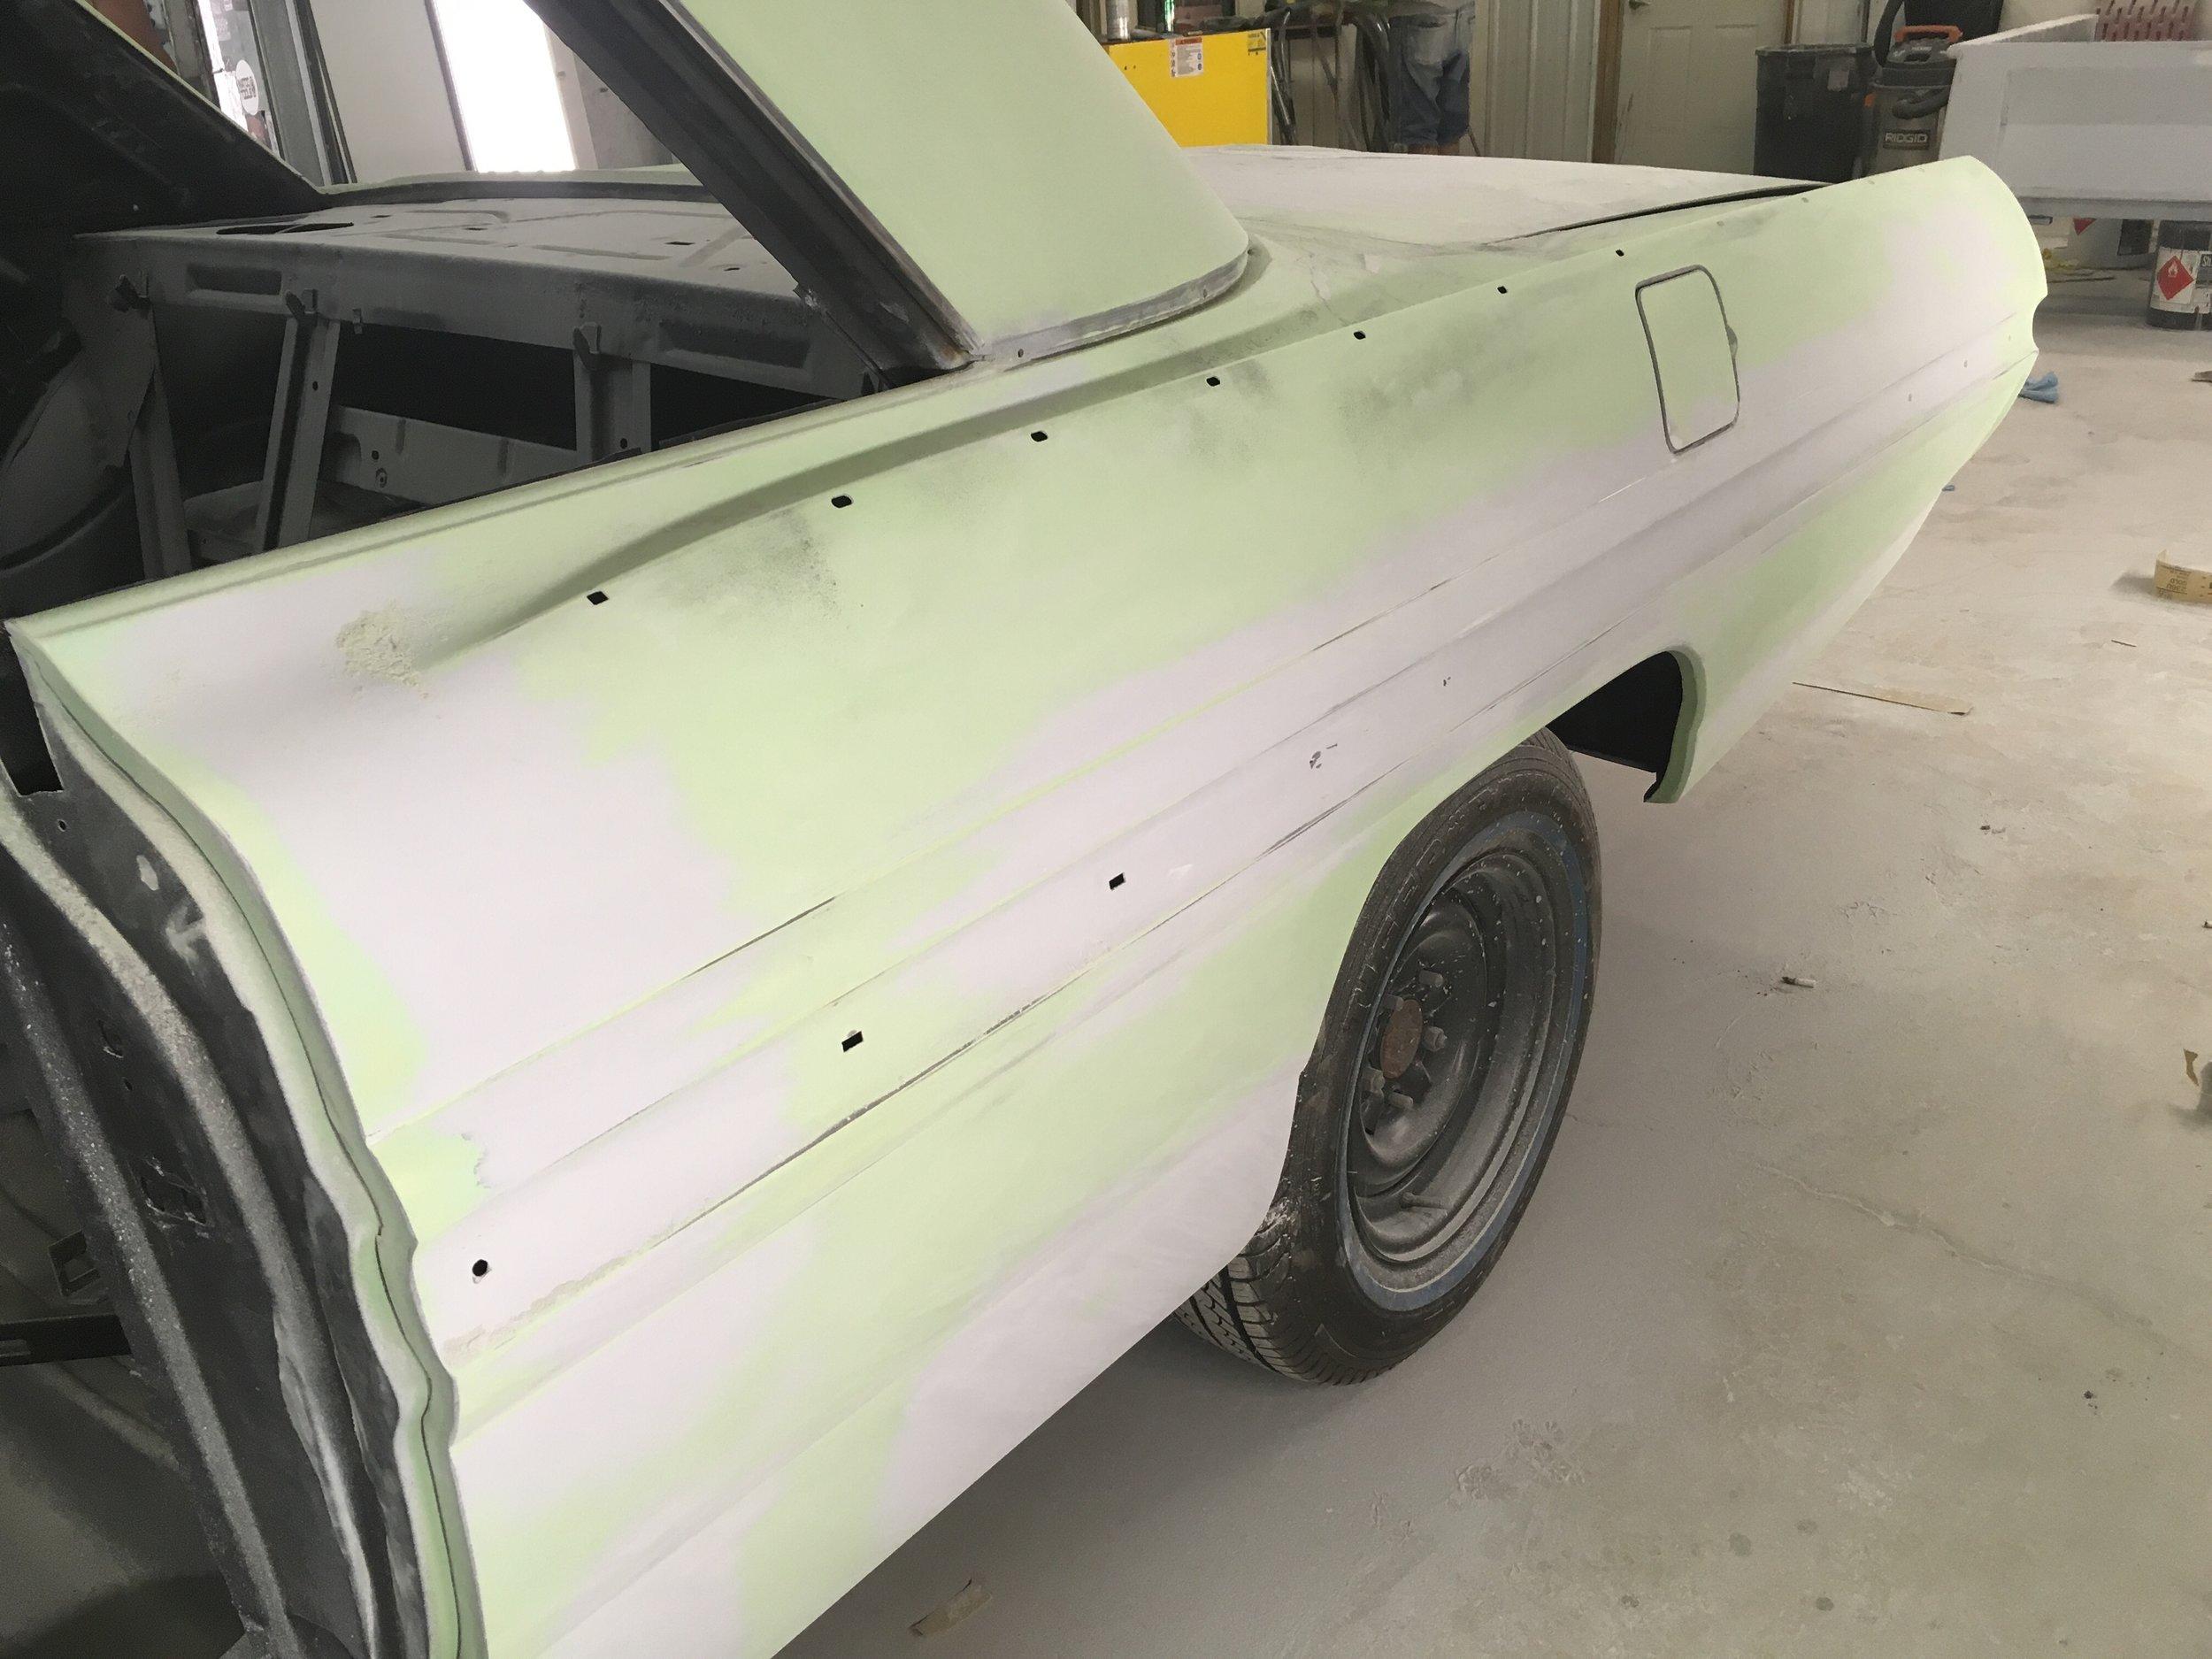 1962-Pontiac-Bonneville-minneapolis-hot-rod-custom-build-restoration-11.jpg